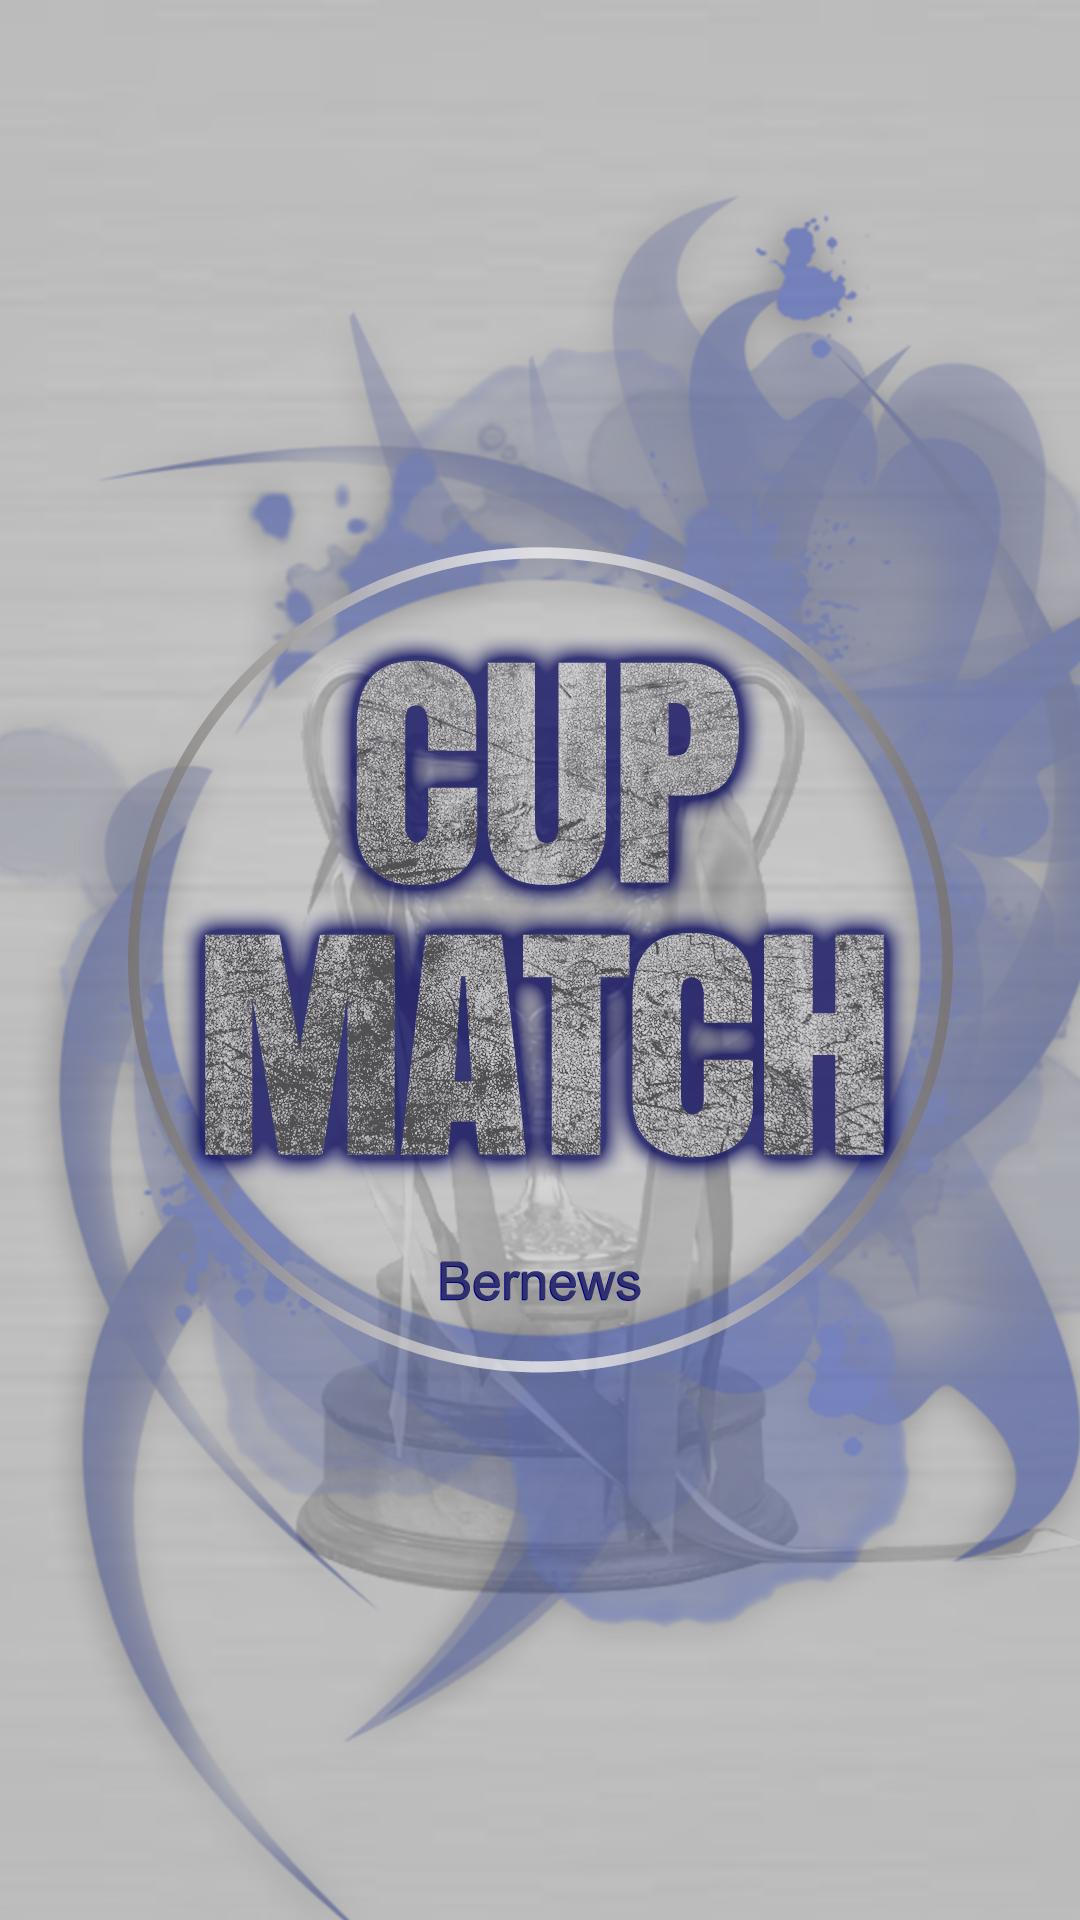 cupmatch wallpaper 6t4353